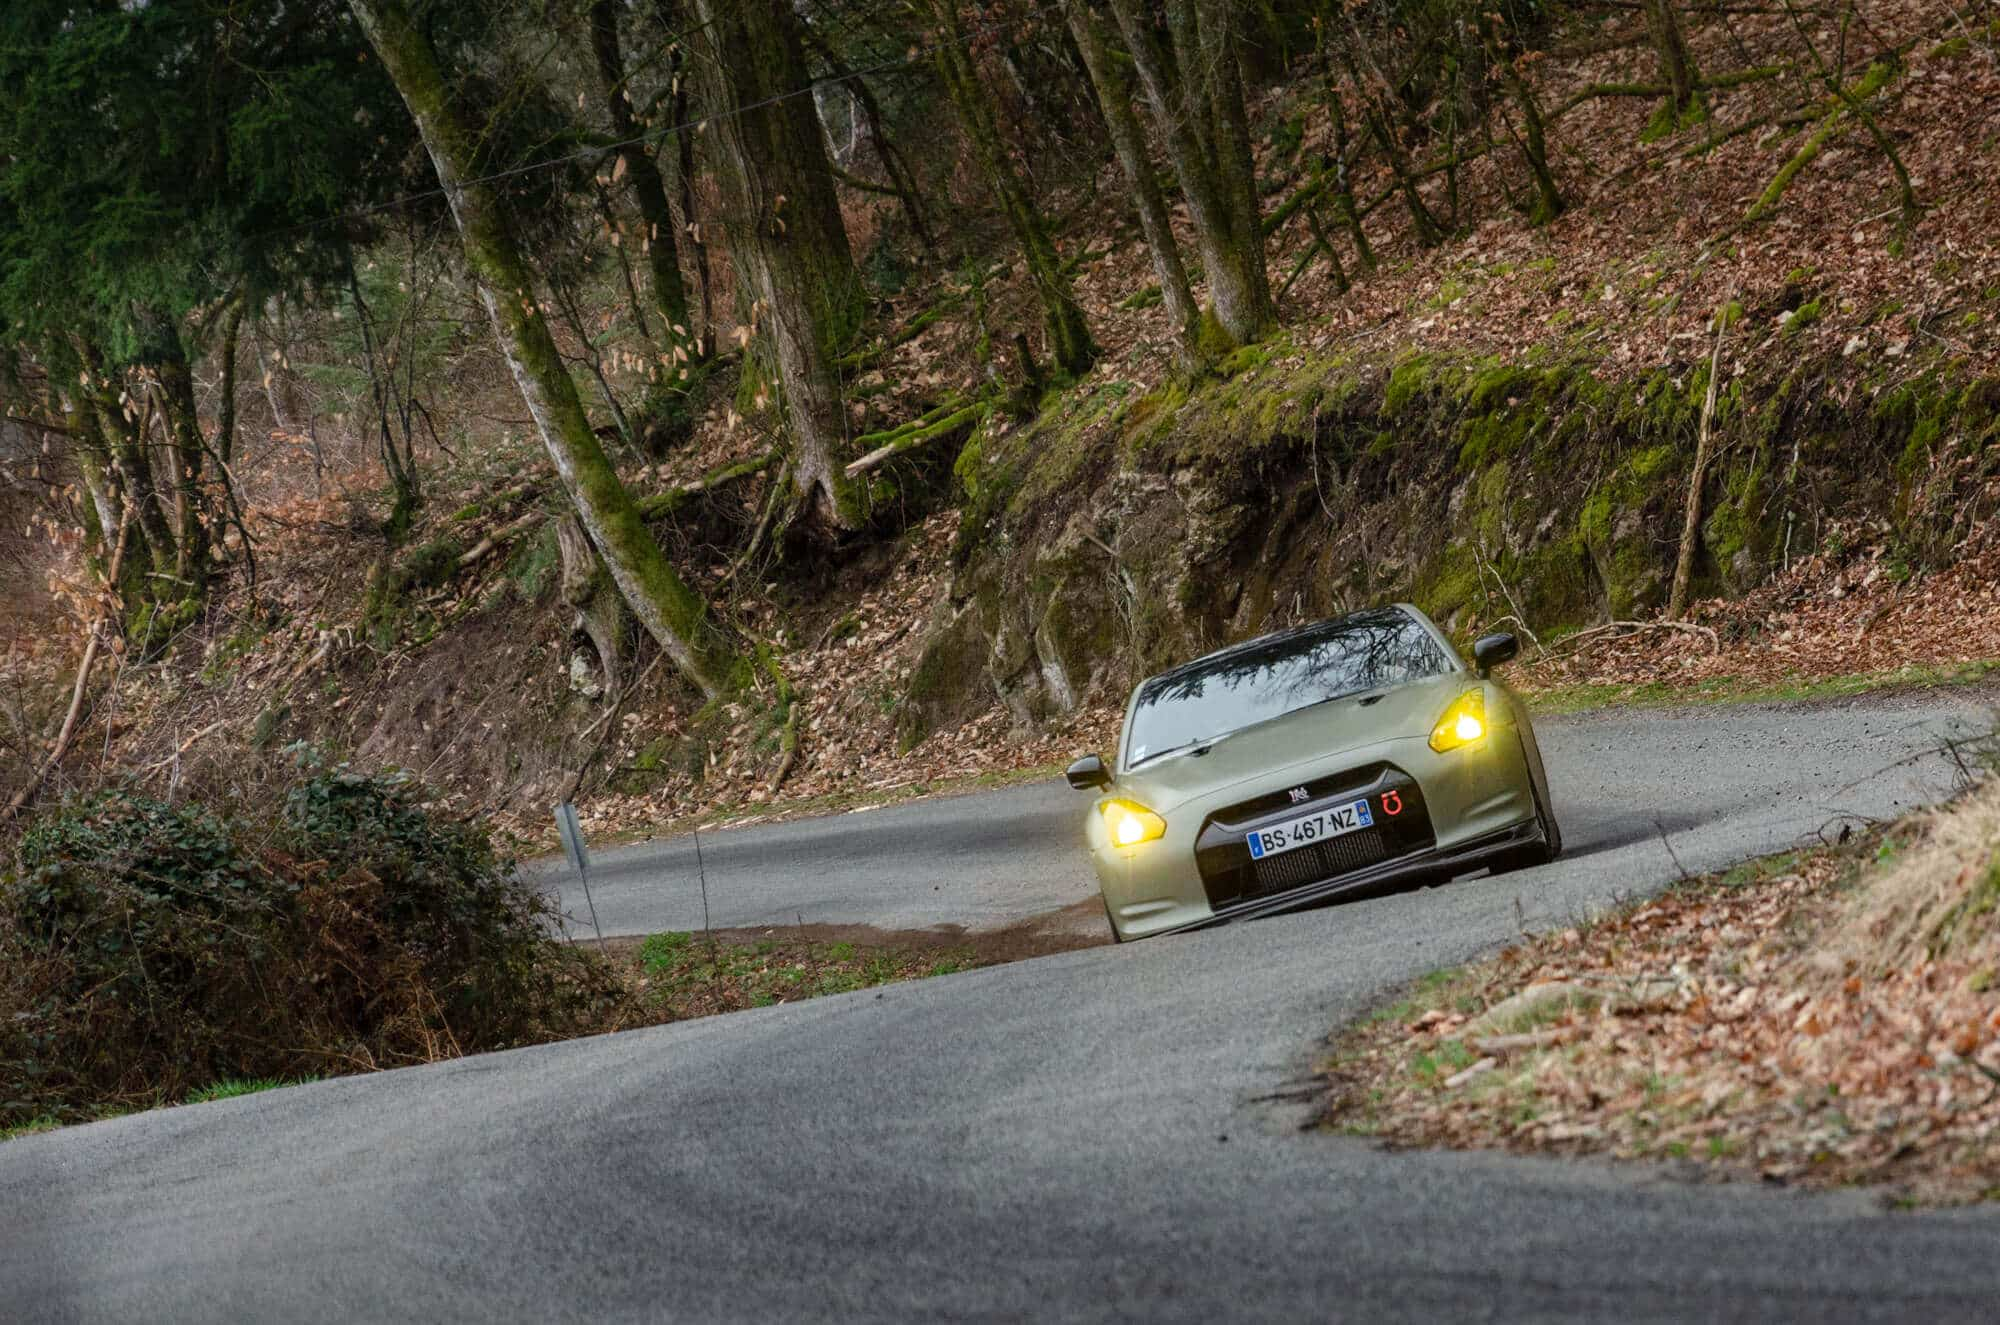 armada-racing-ronde-des-belles-2019-nissan-GTR-2